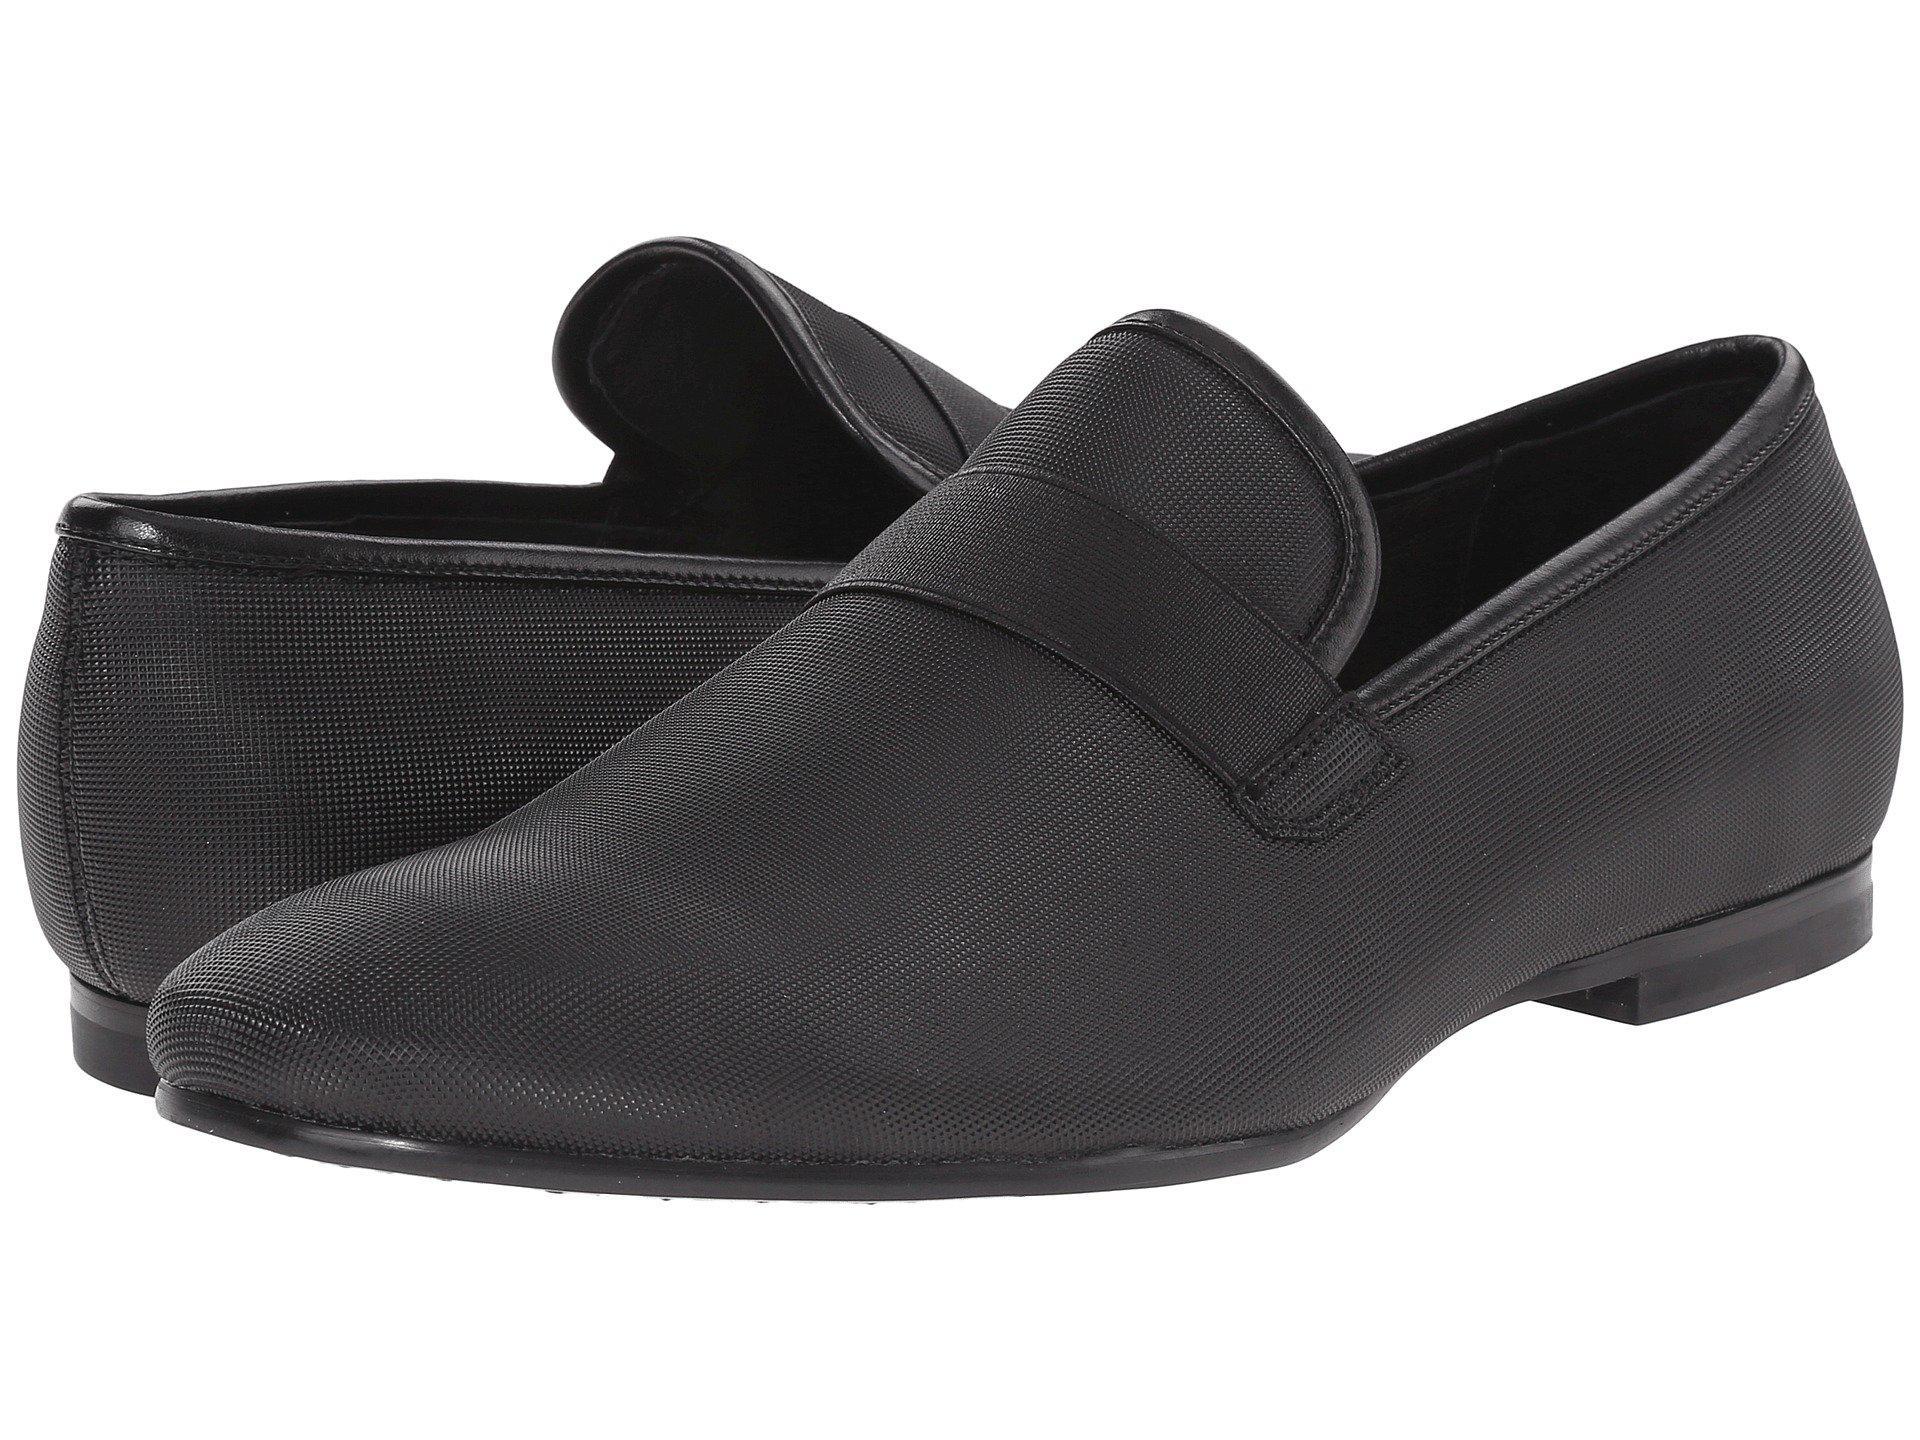 Mens Shoes Calvin Klein Nicco Black Smooth